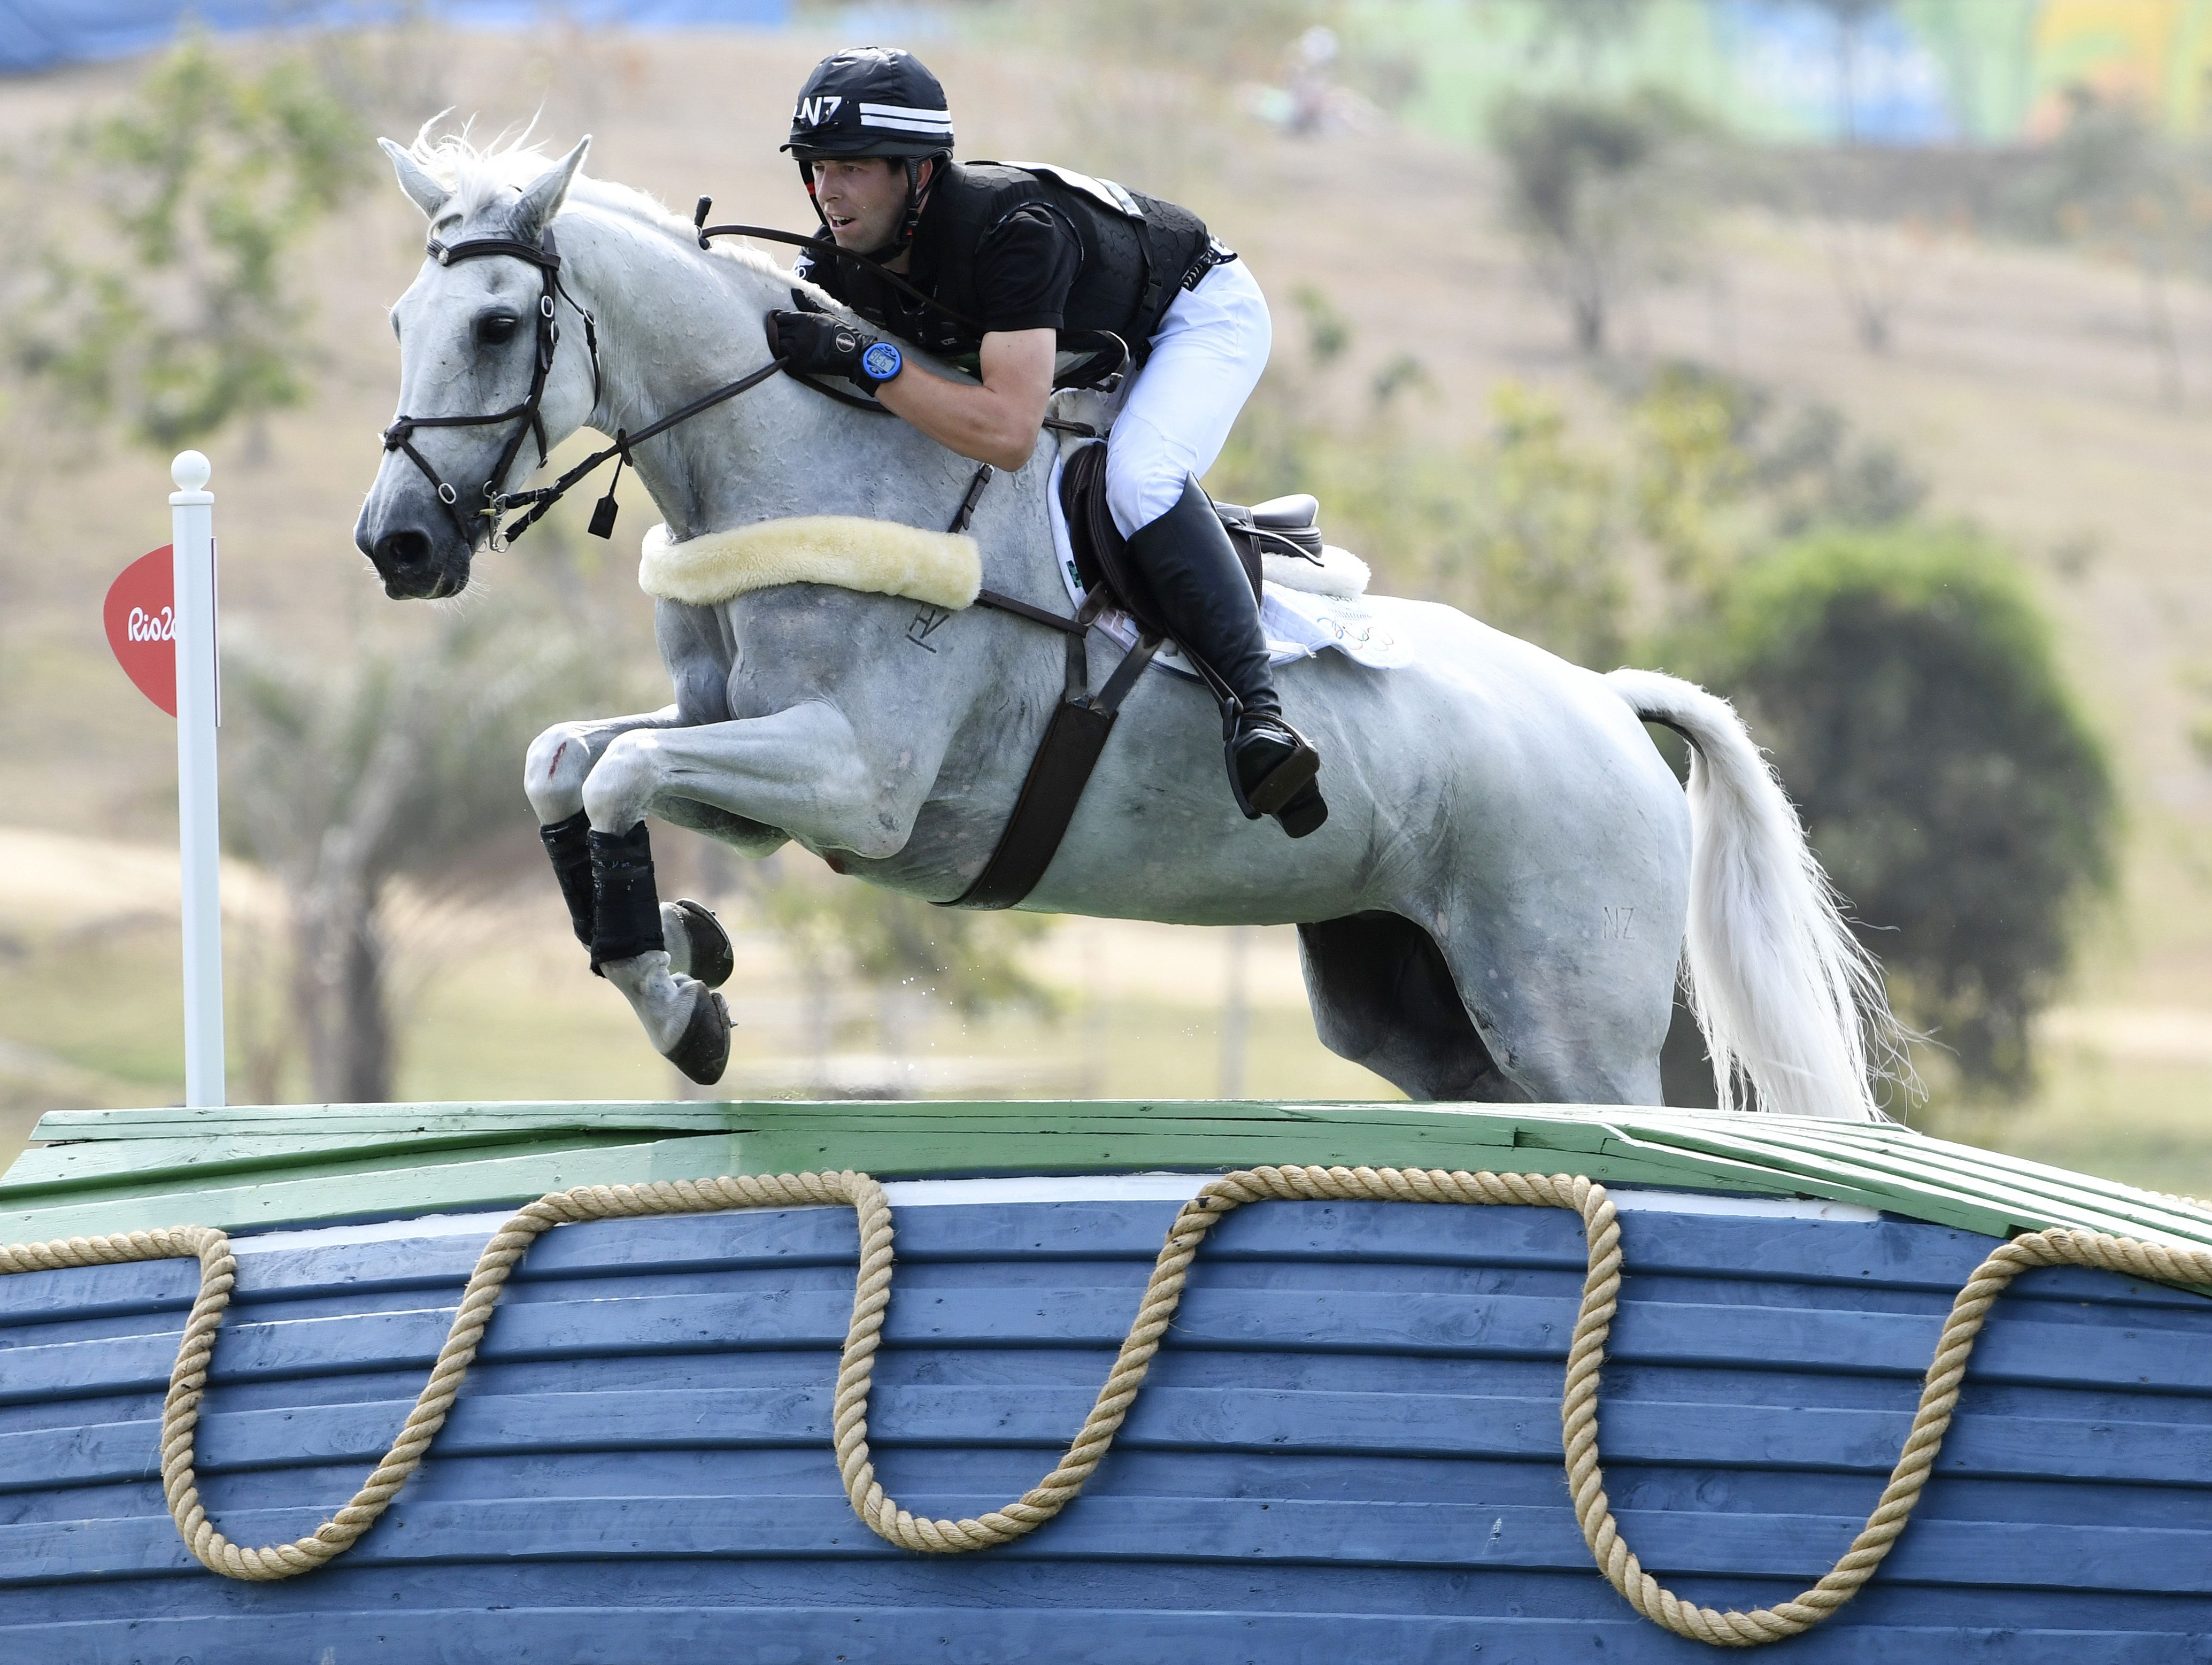 Olympics, live sream, equestrian, jumping